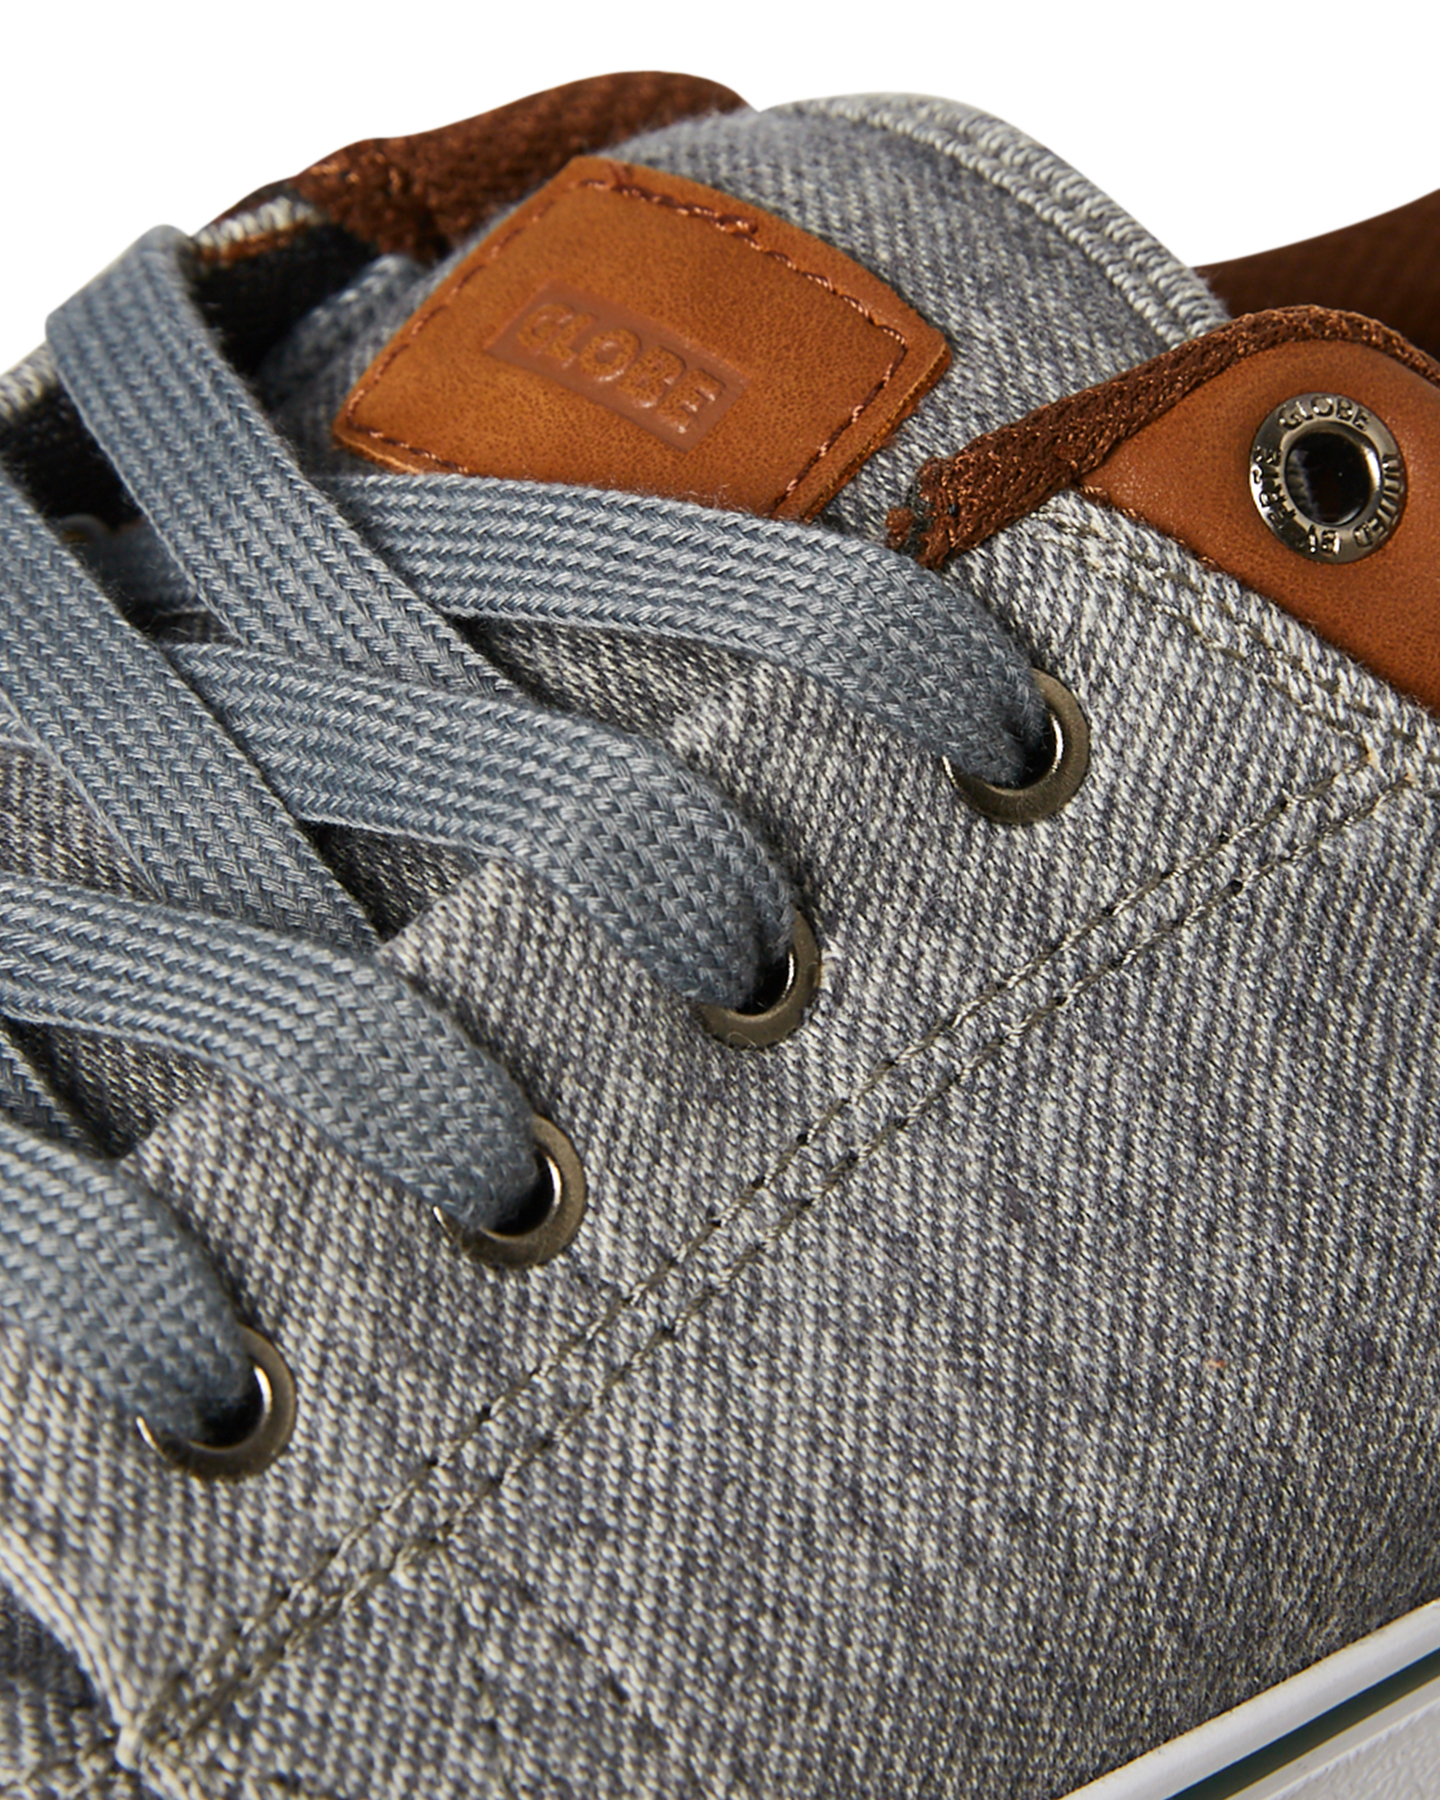 New-Globe-Men-039-s-Gs-Shoe-Rubber-Pu-Grey thumbnail 25